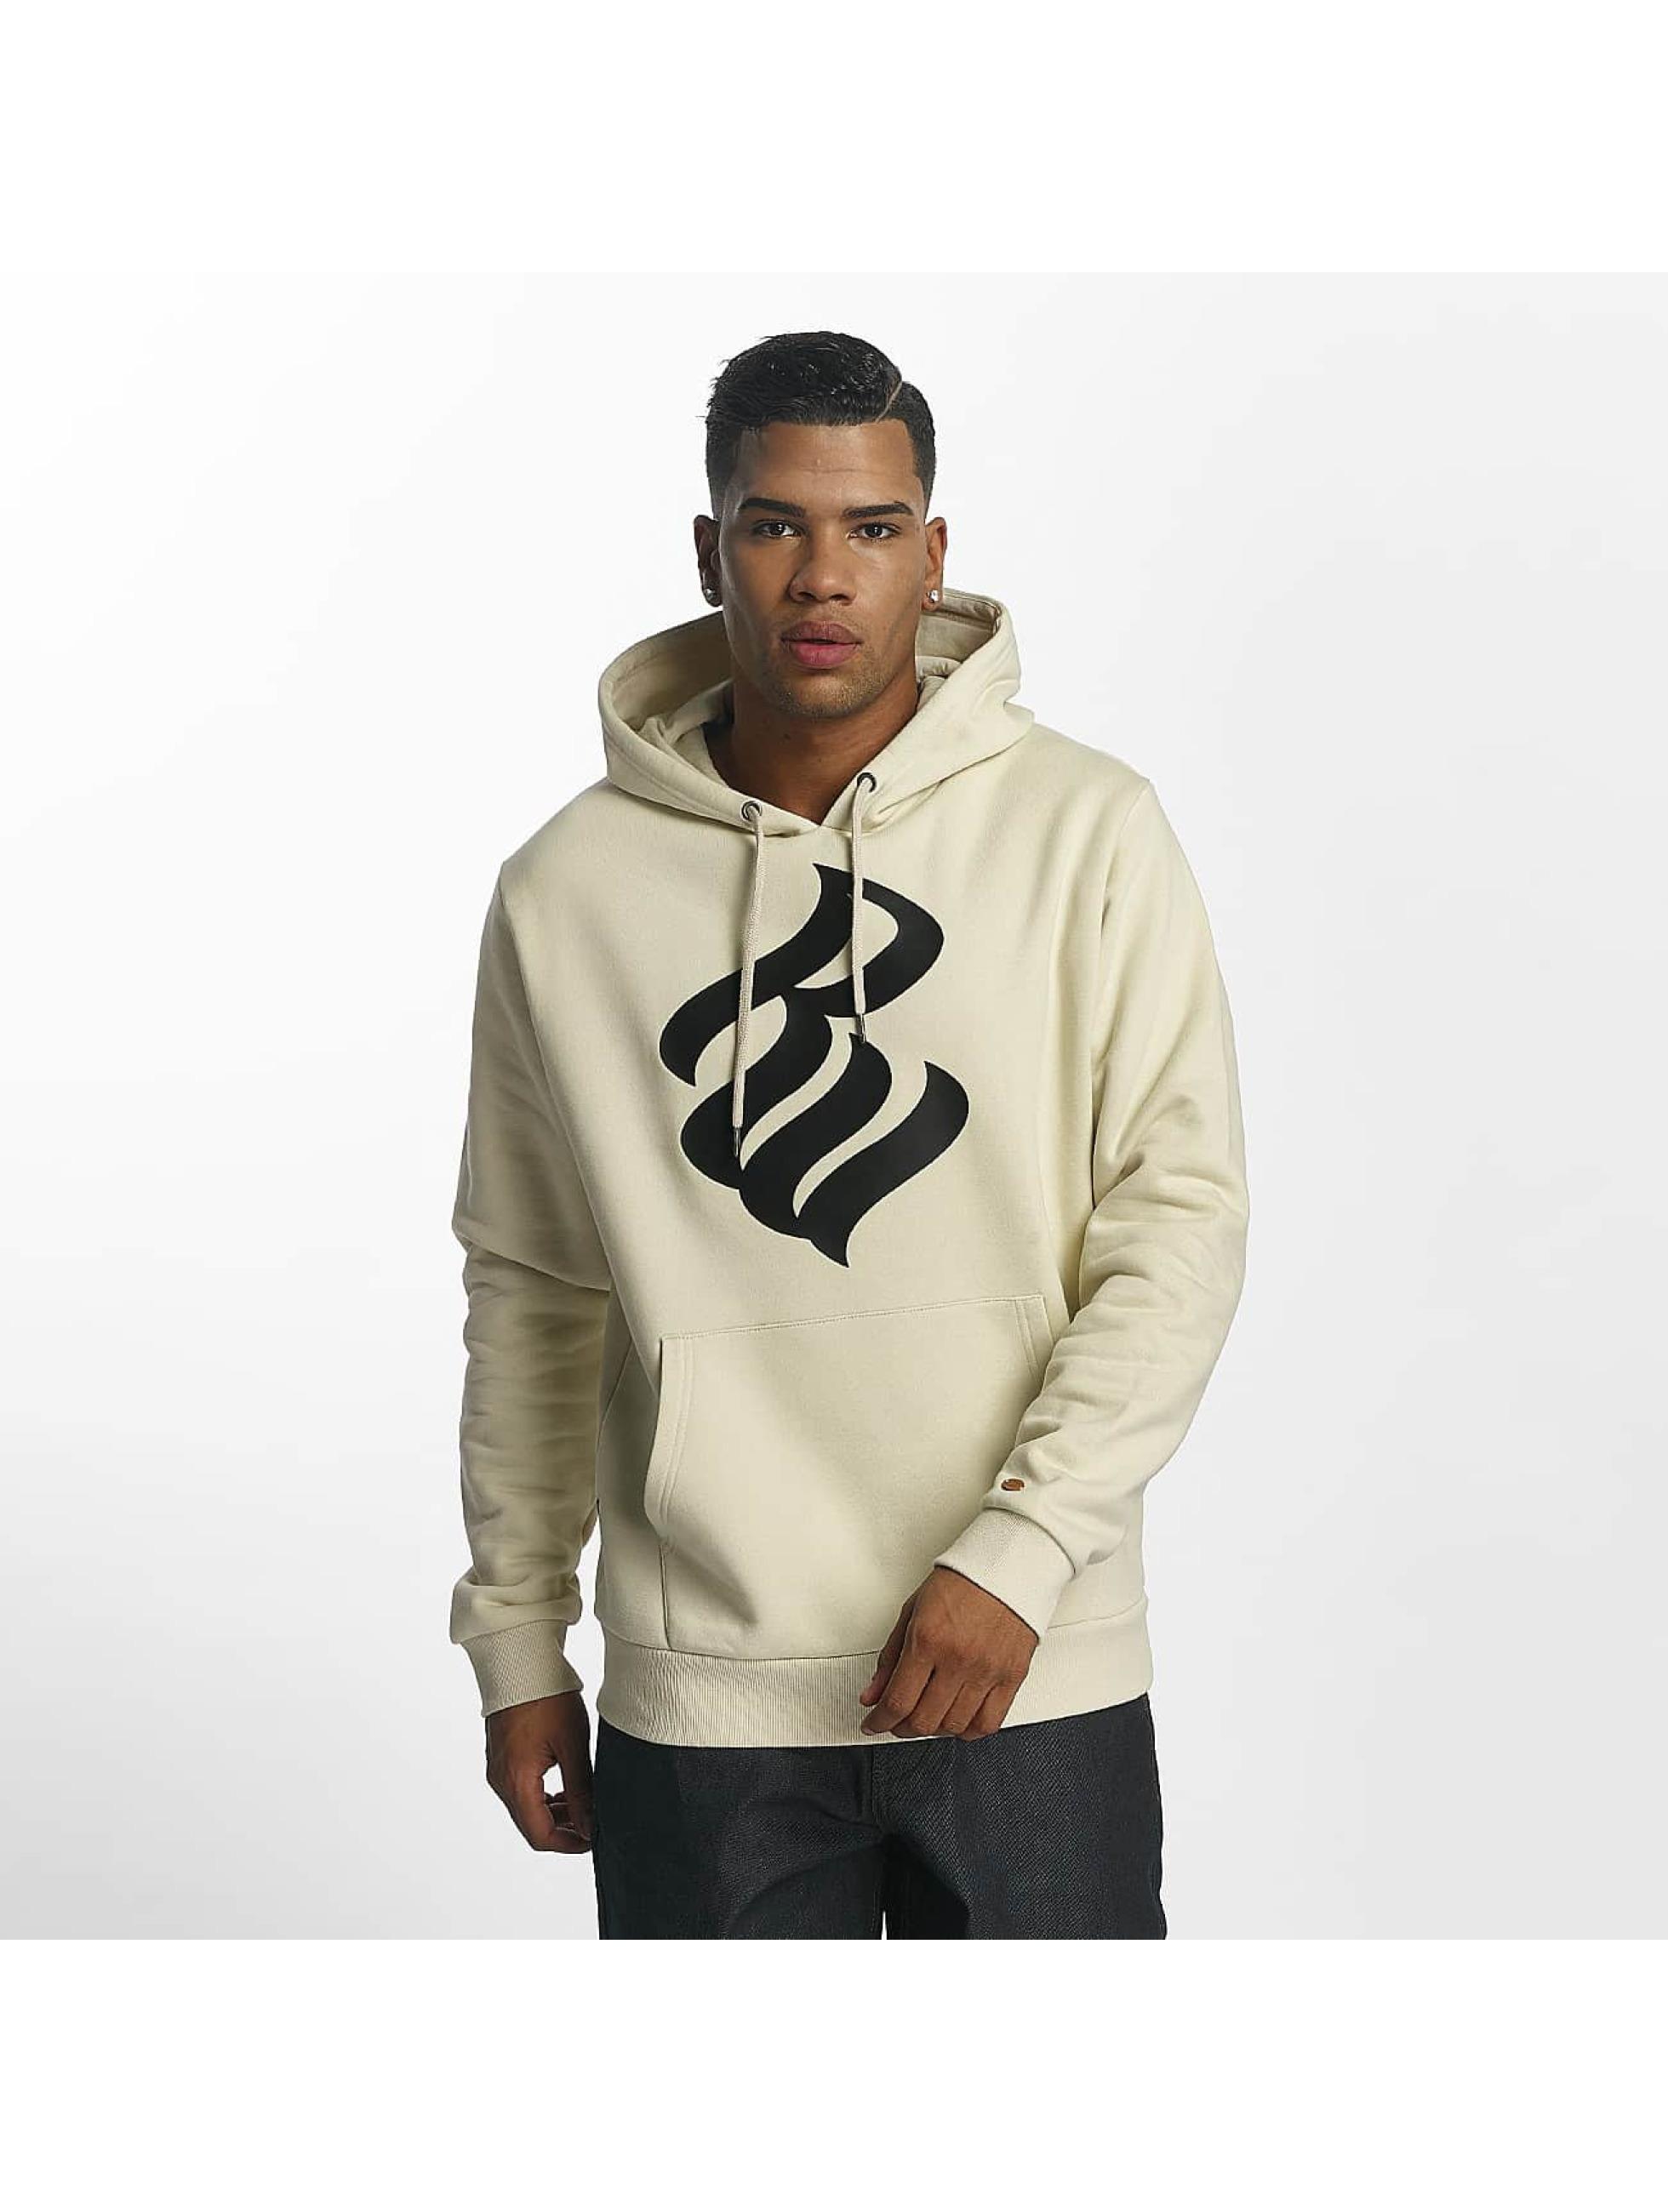 Rocawear / Hoodie Basic in beige S